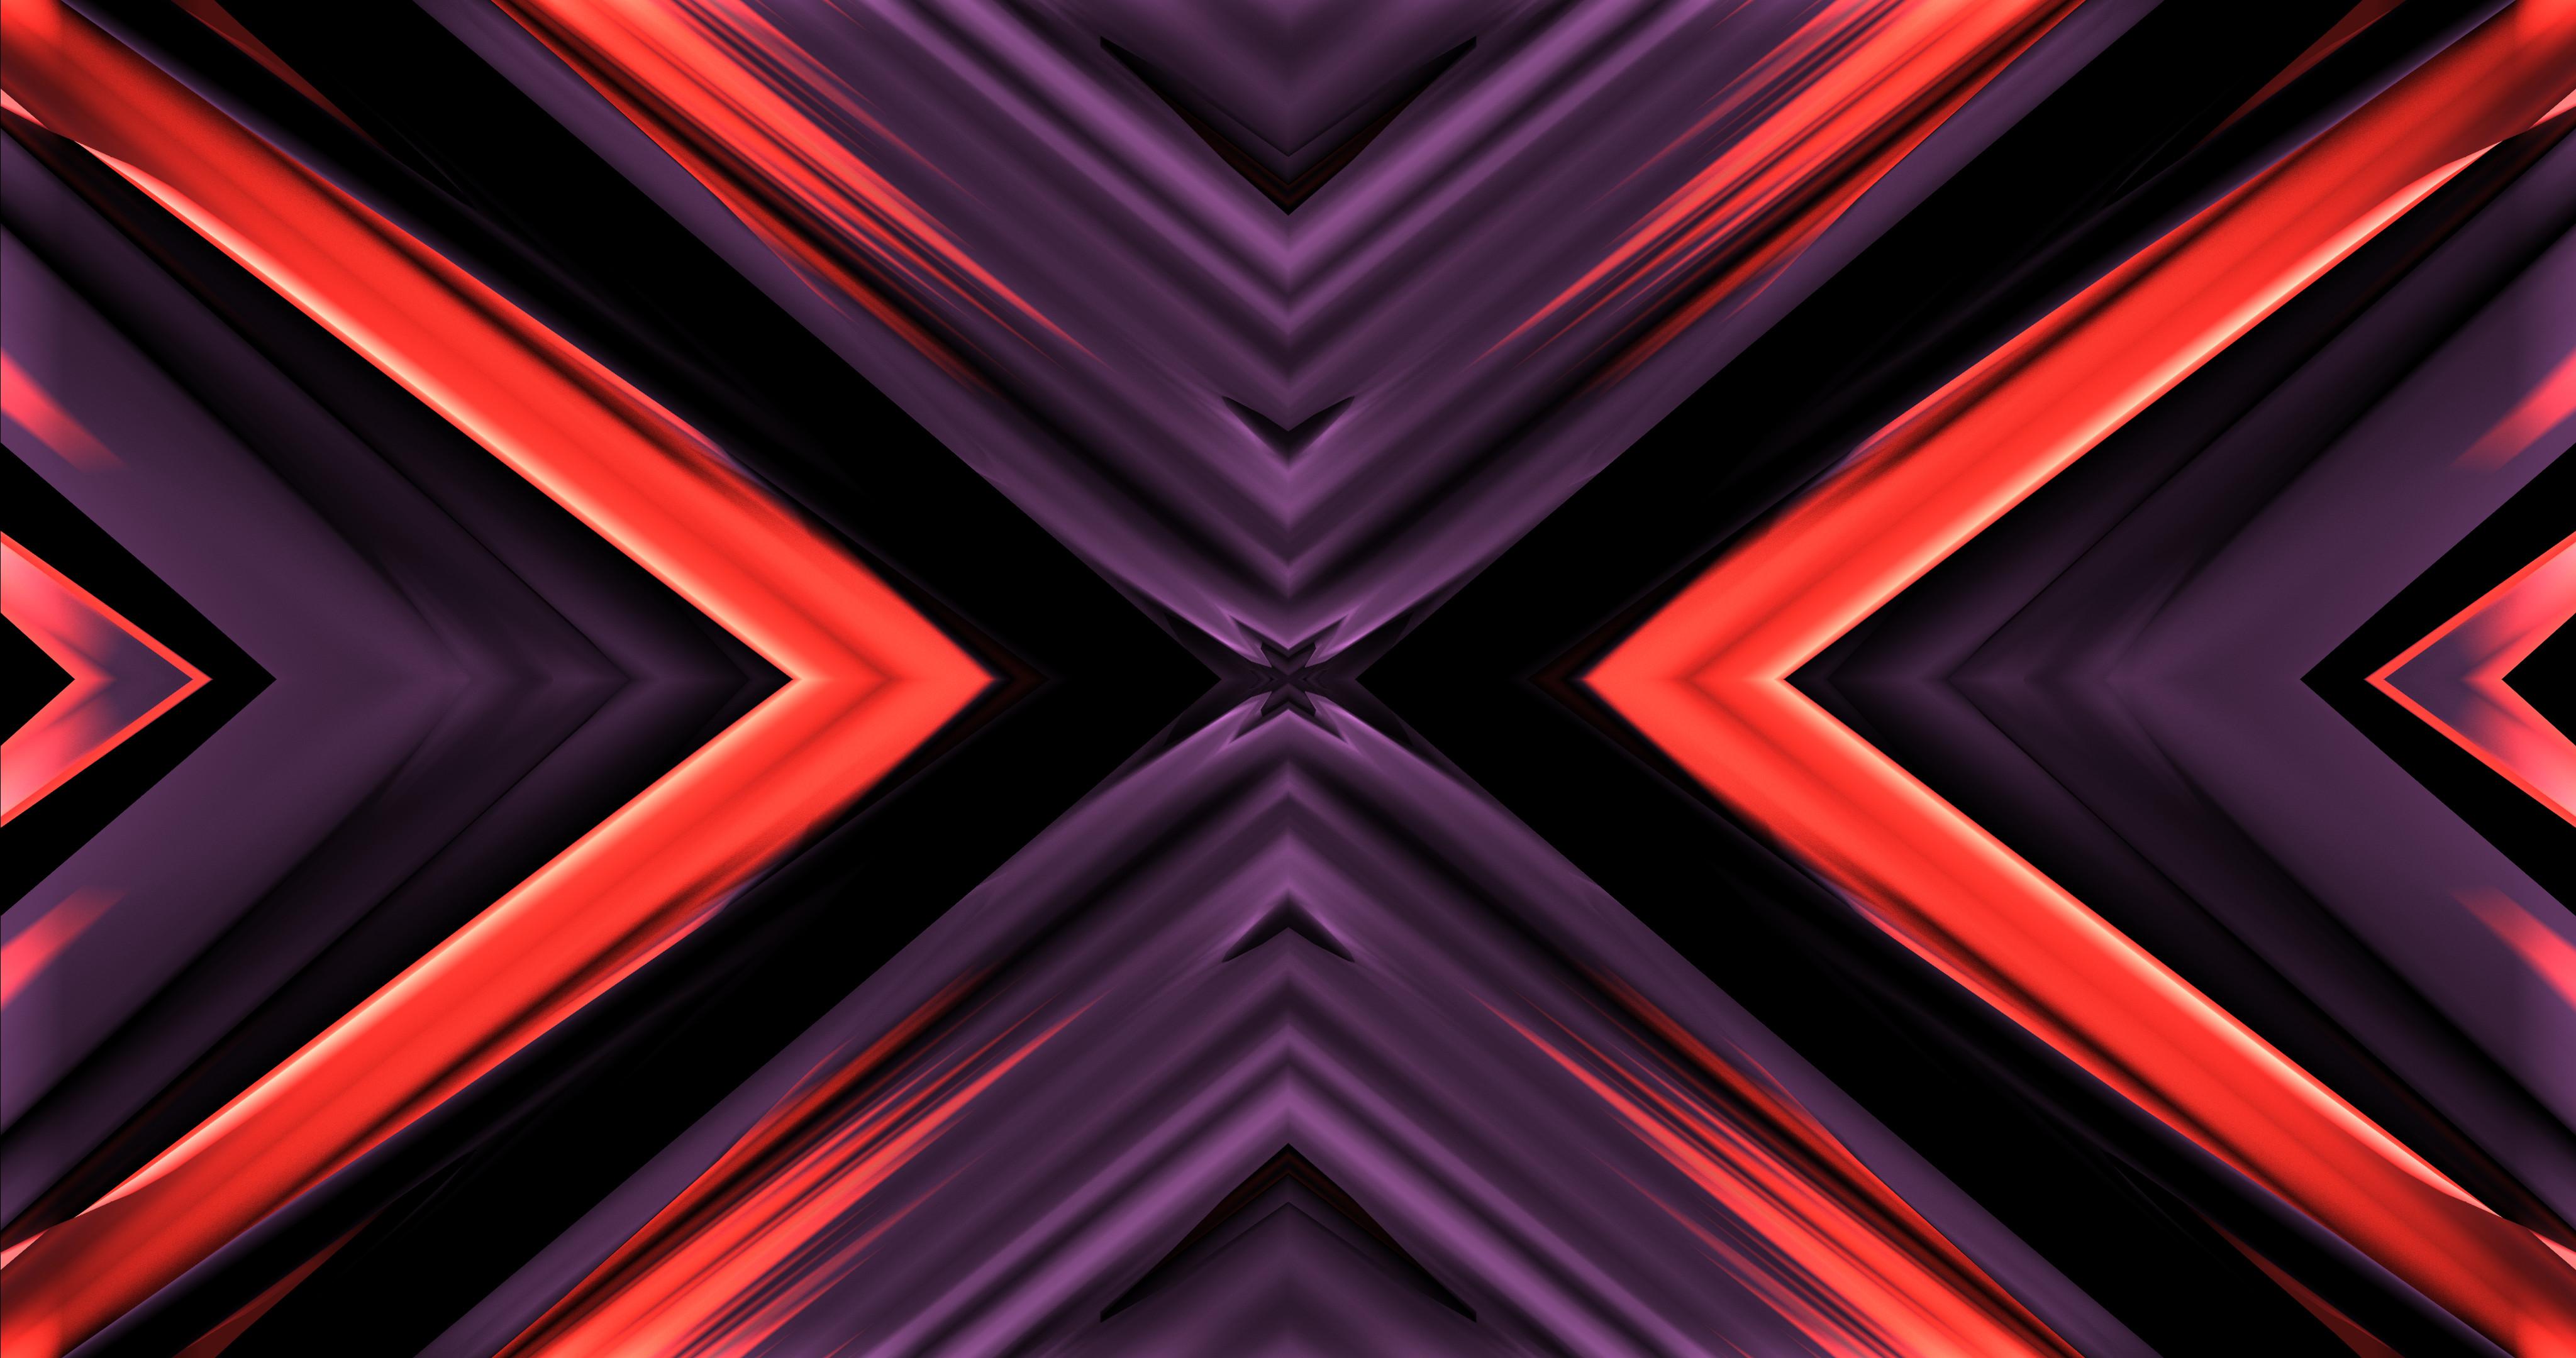 FREE PurpleREFLECT 4K Wallpaper